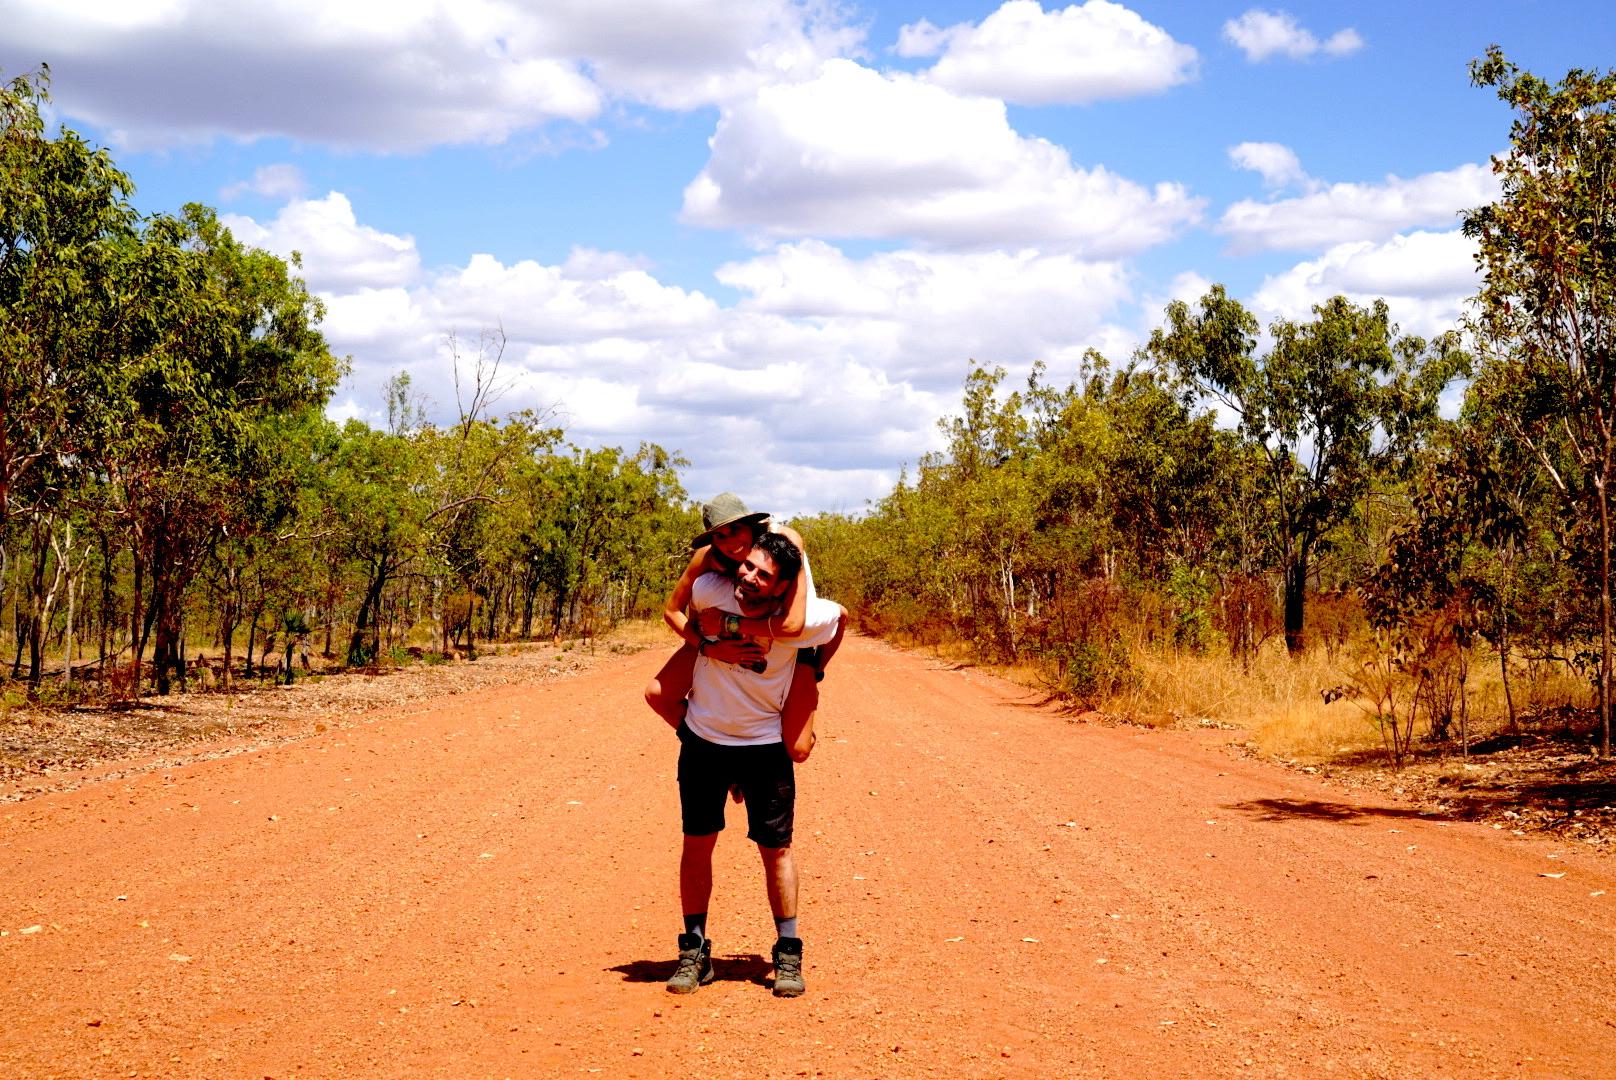 Perth siti di incontri Australia Emmanuelle Chriqui incontri Usher